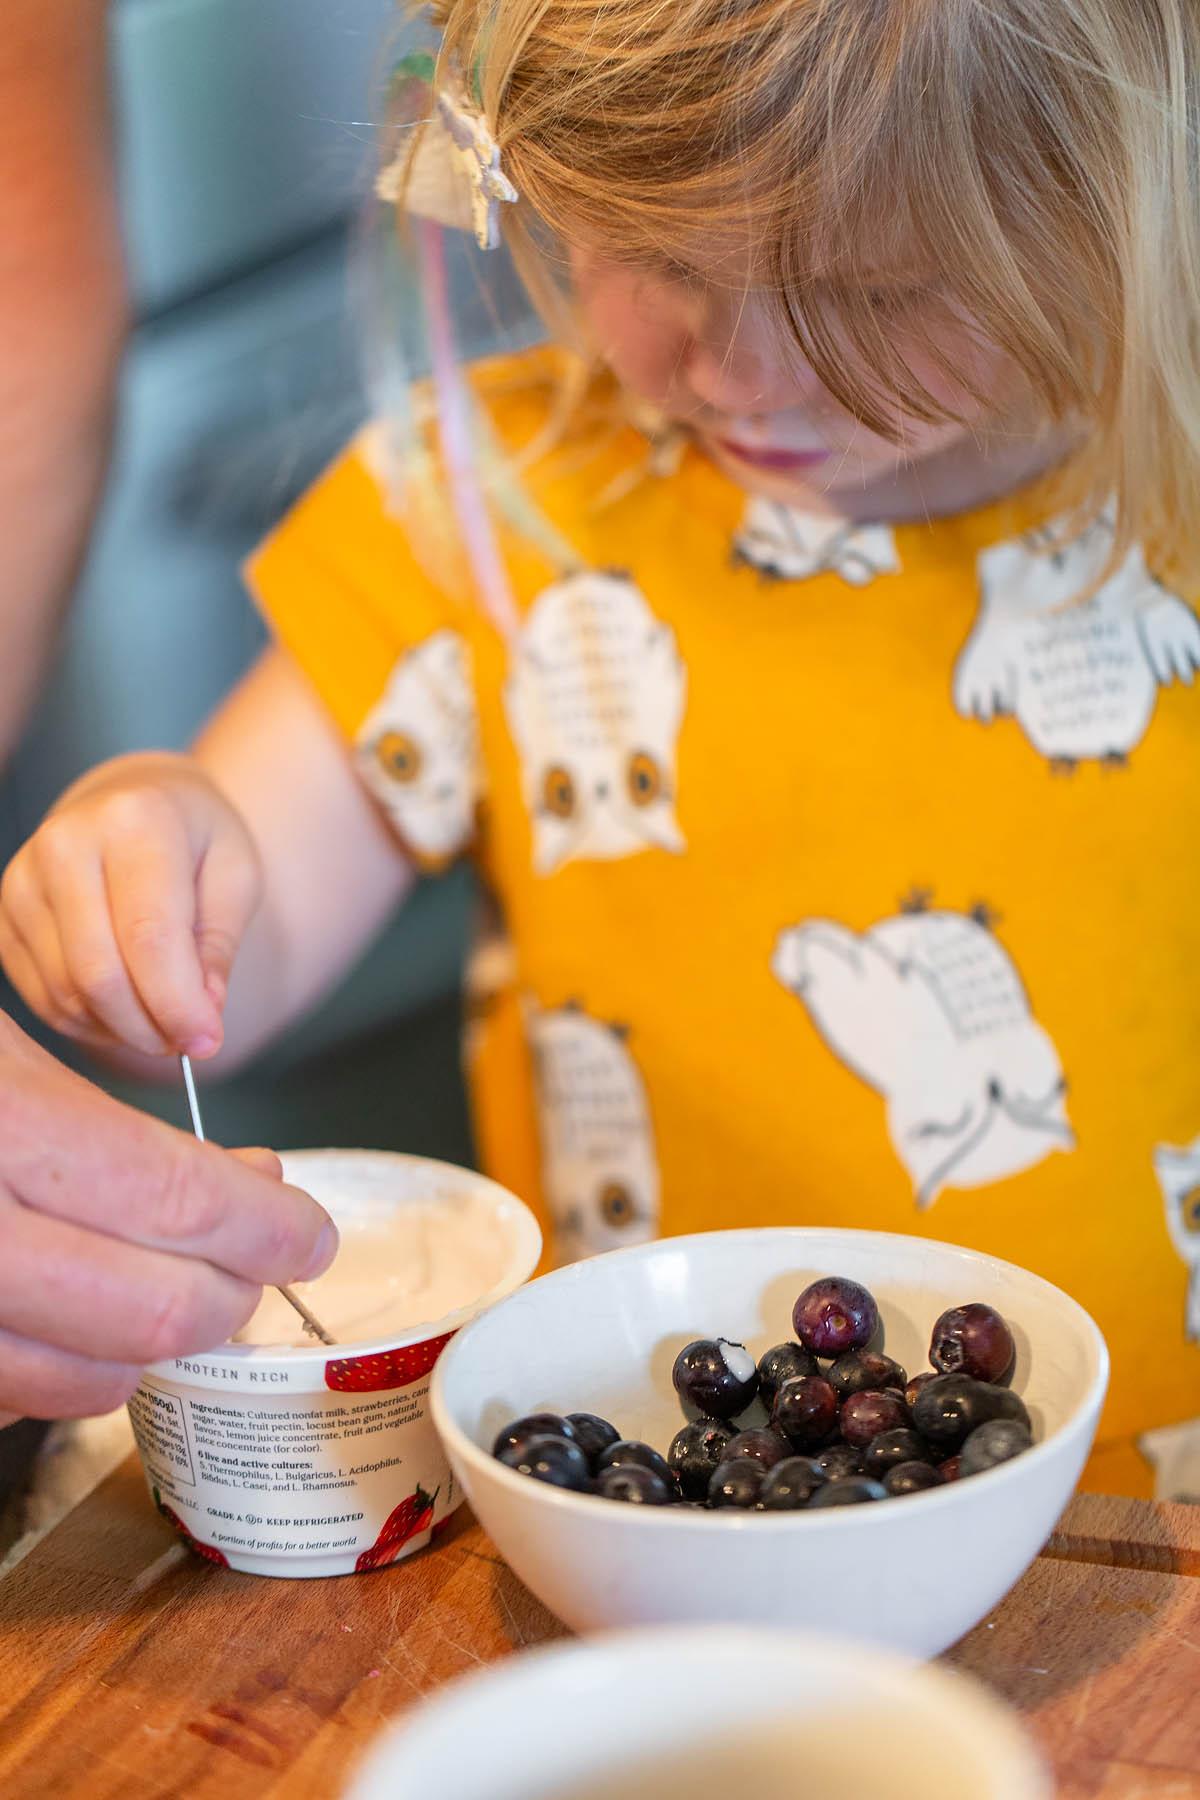 dipping blueberries into greek yogurt